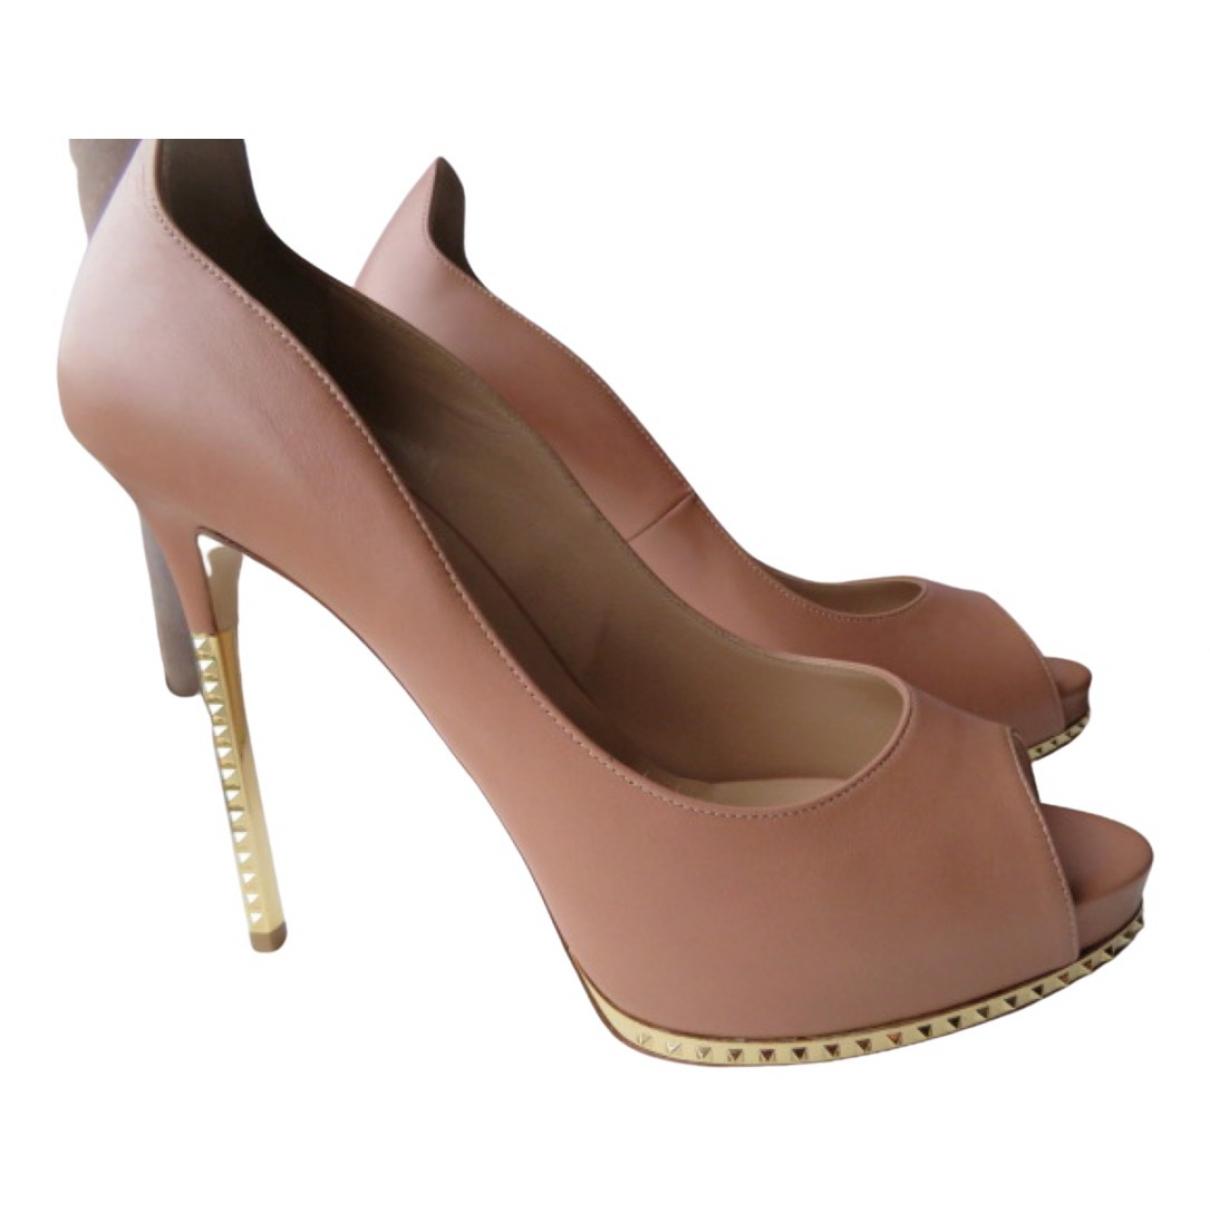 Valentino Garavani Rockstud Beige Leather Heels for Women 40 EU